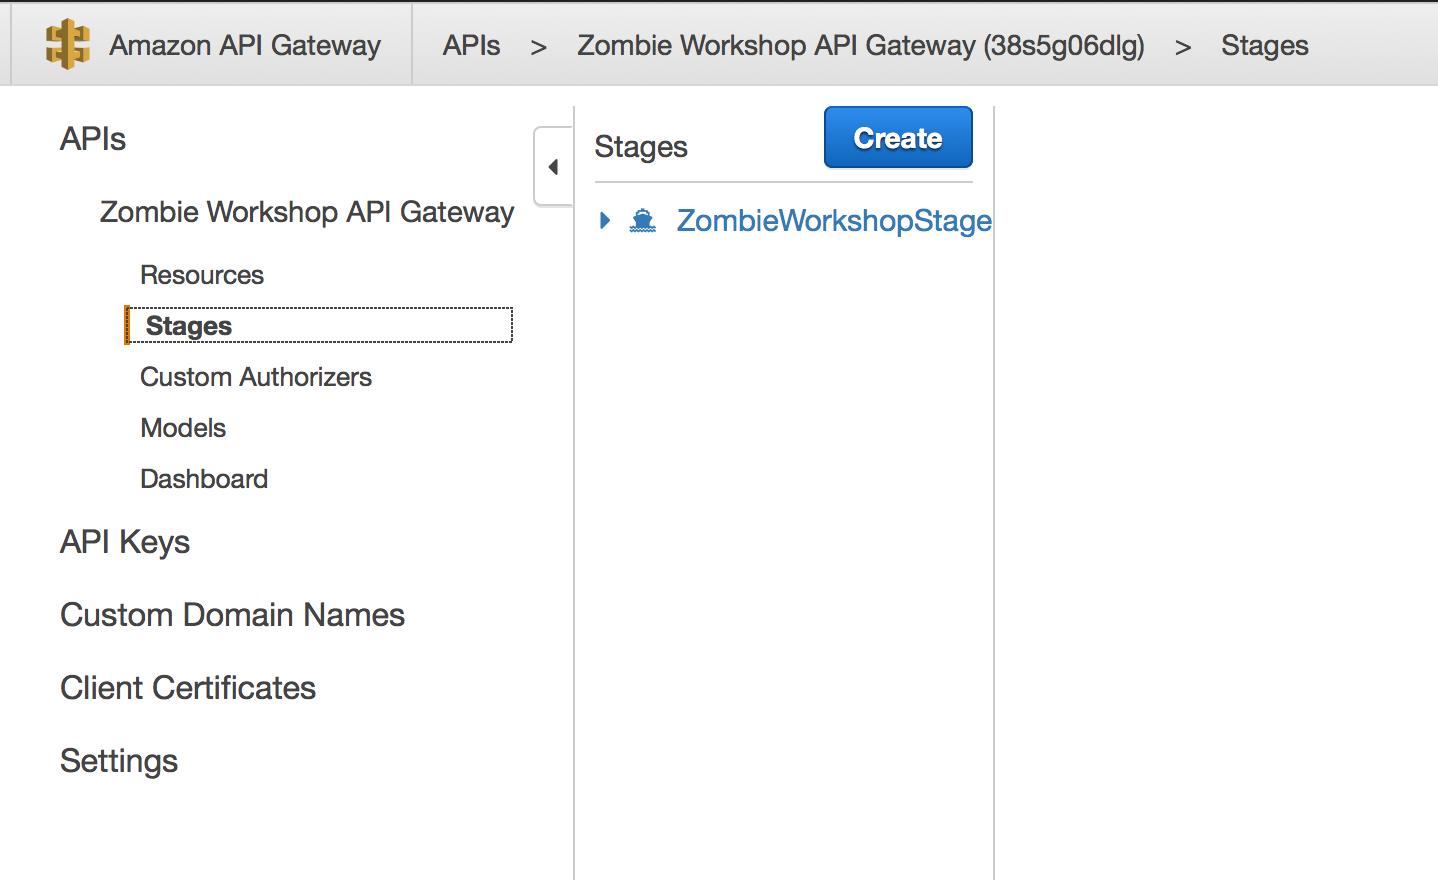 aws-lambda-zombie-workshop by aws-samples